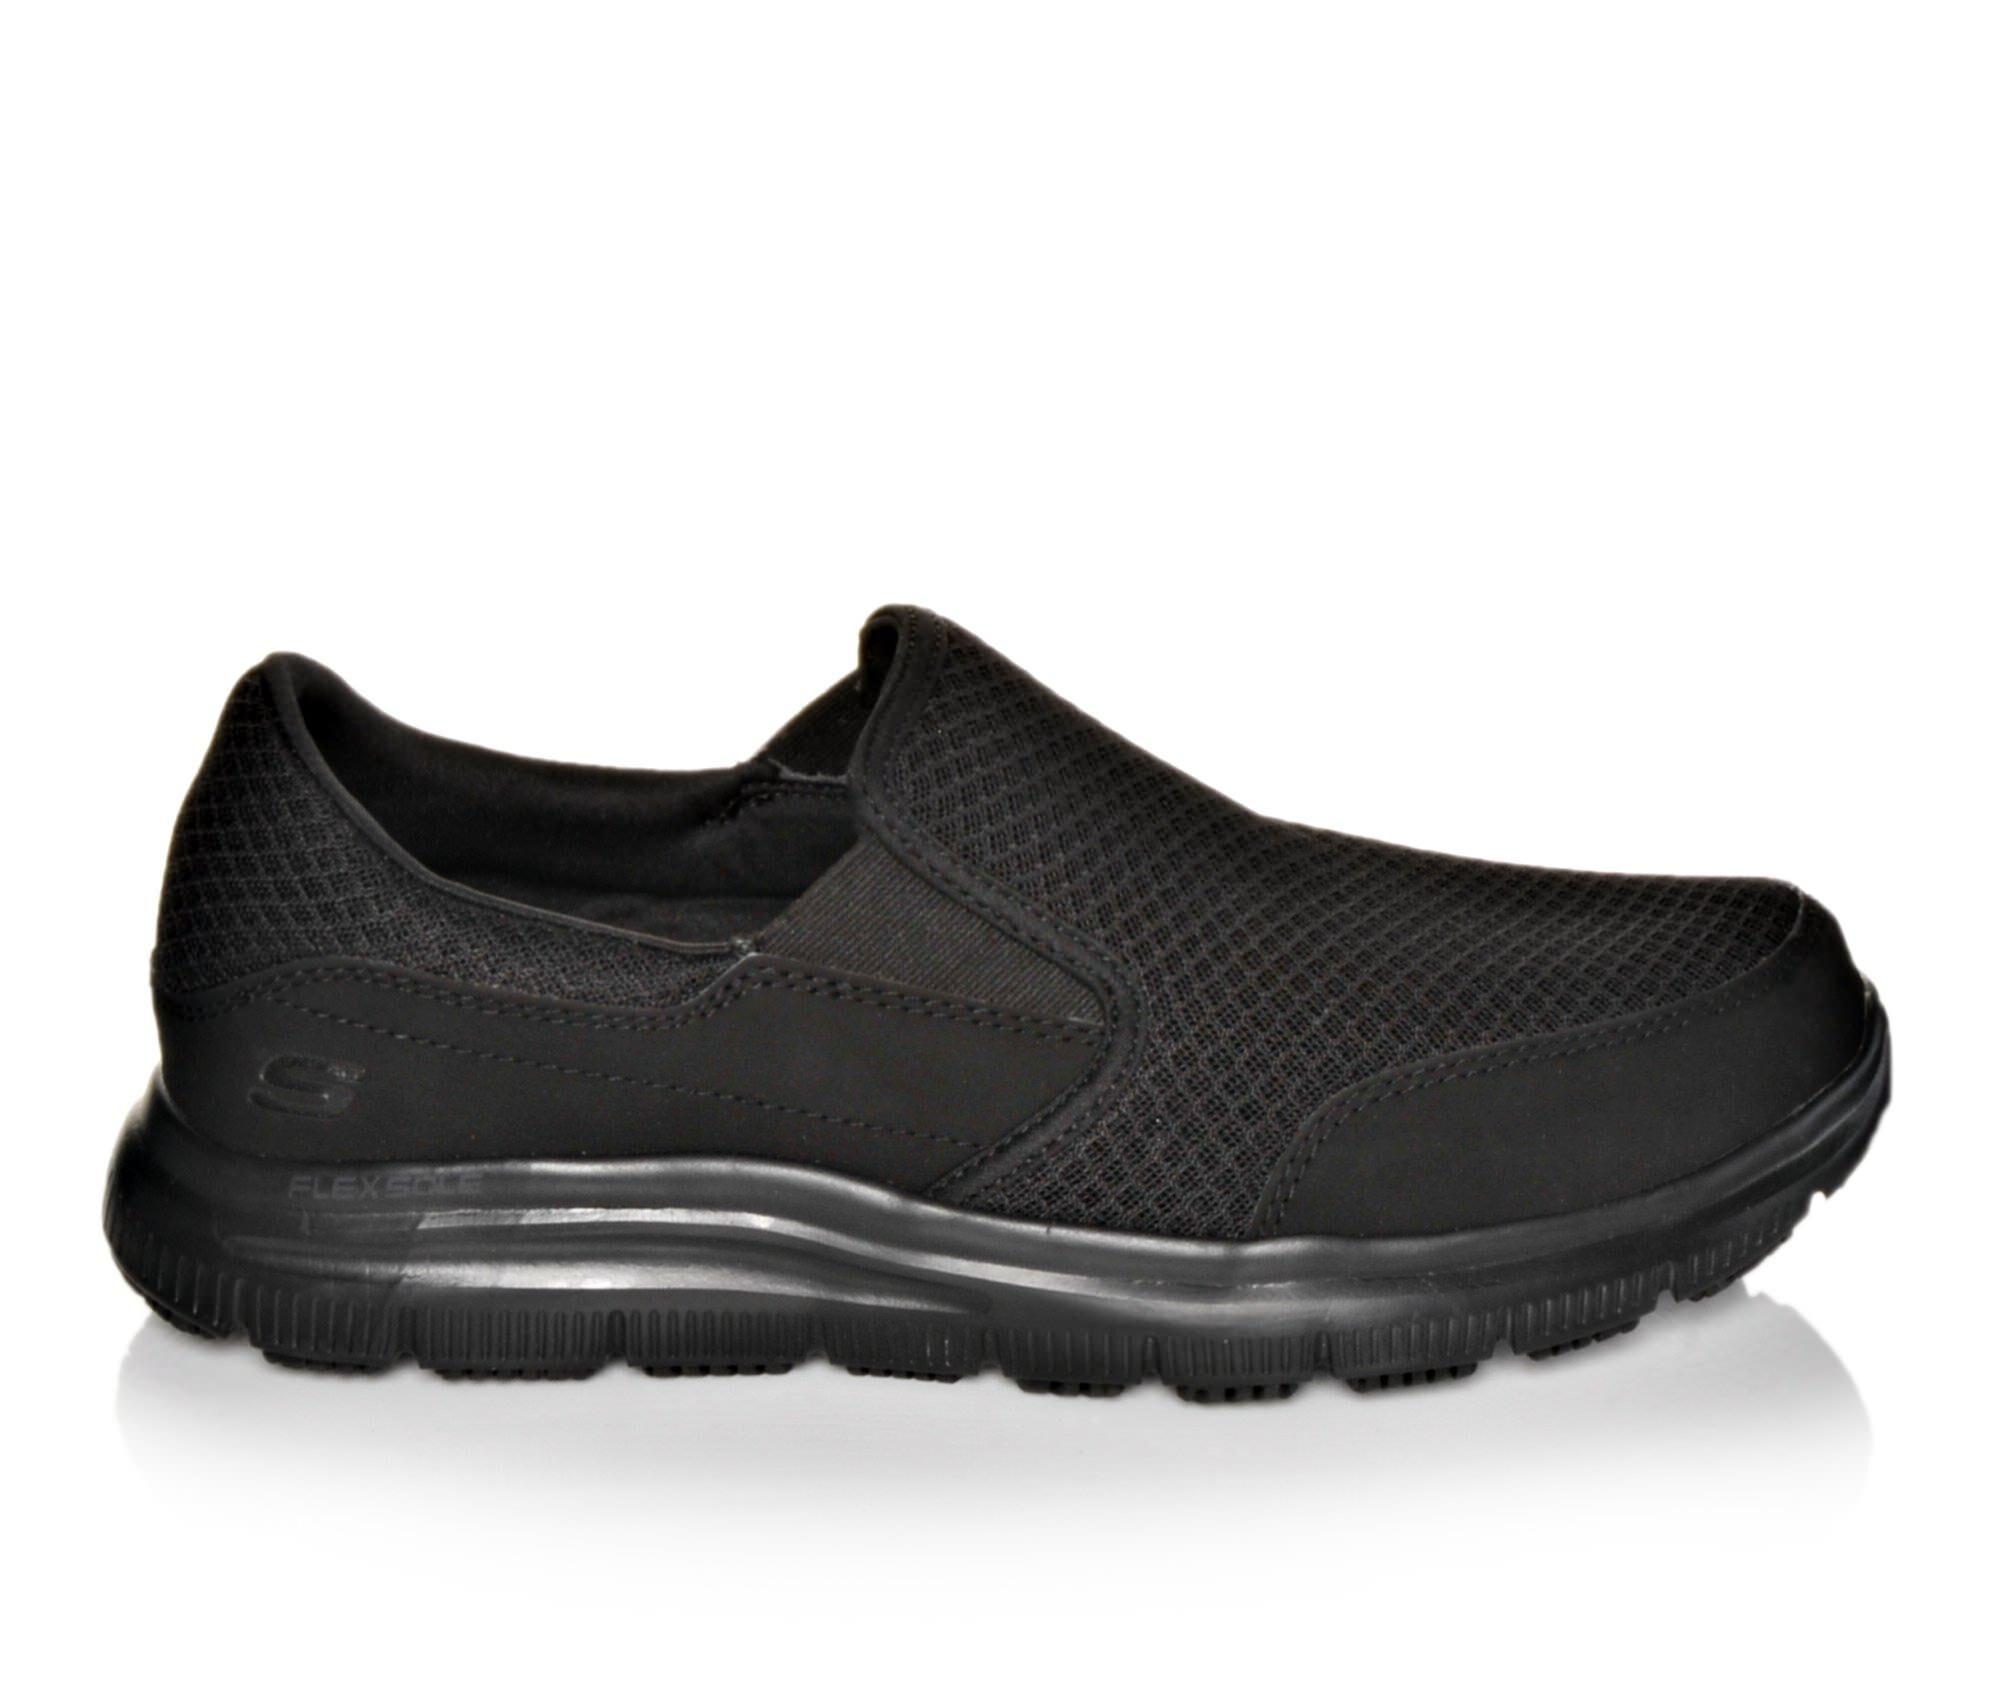 Men's Skechers Work 77048 McAllen Safety Shoes Black